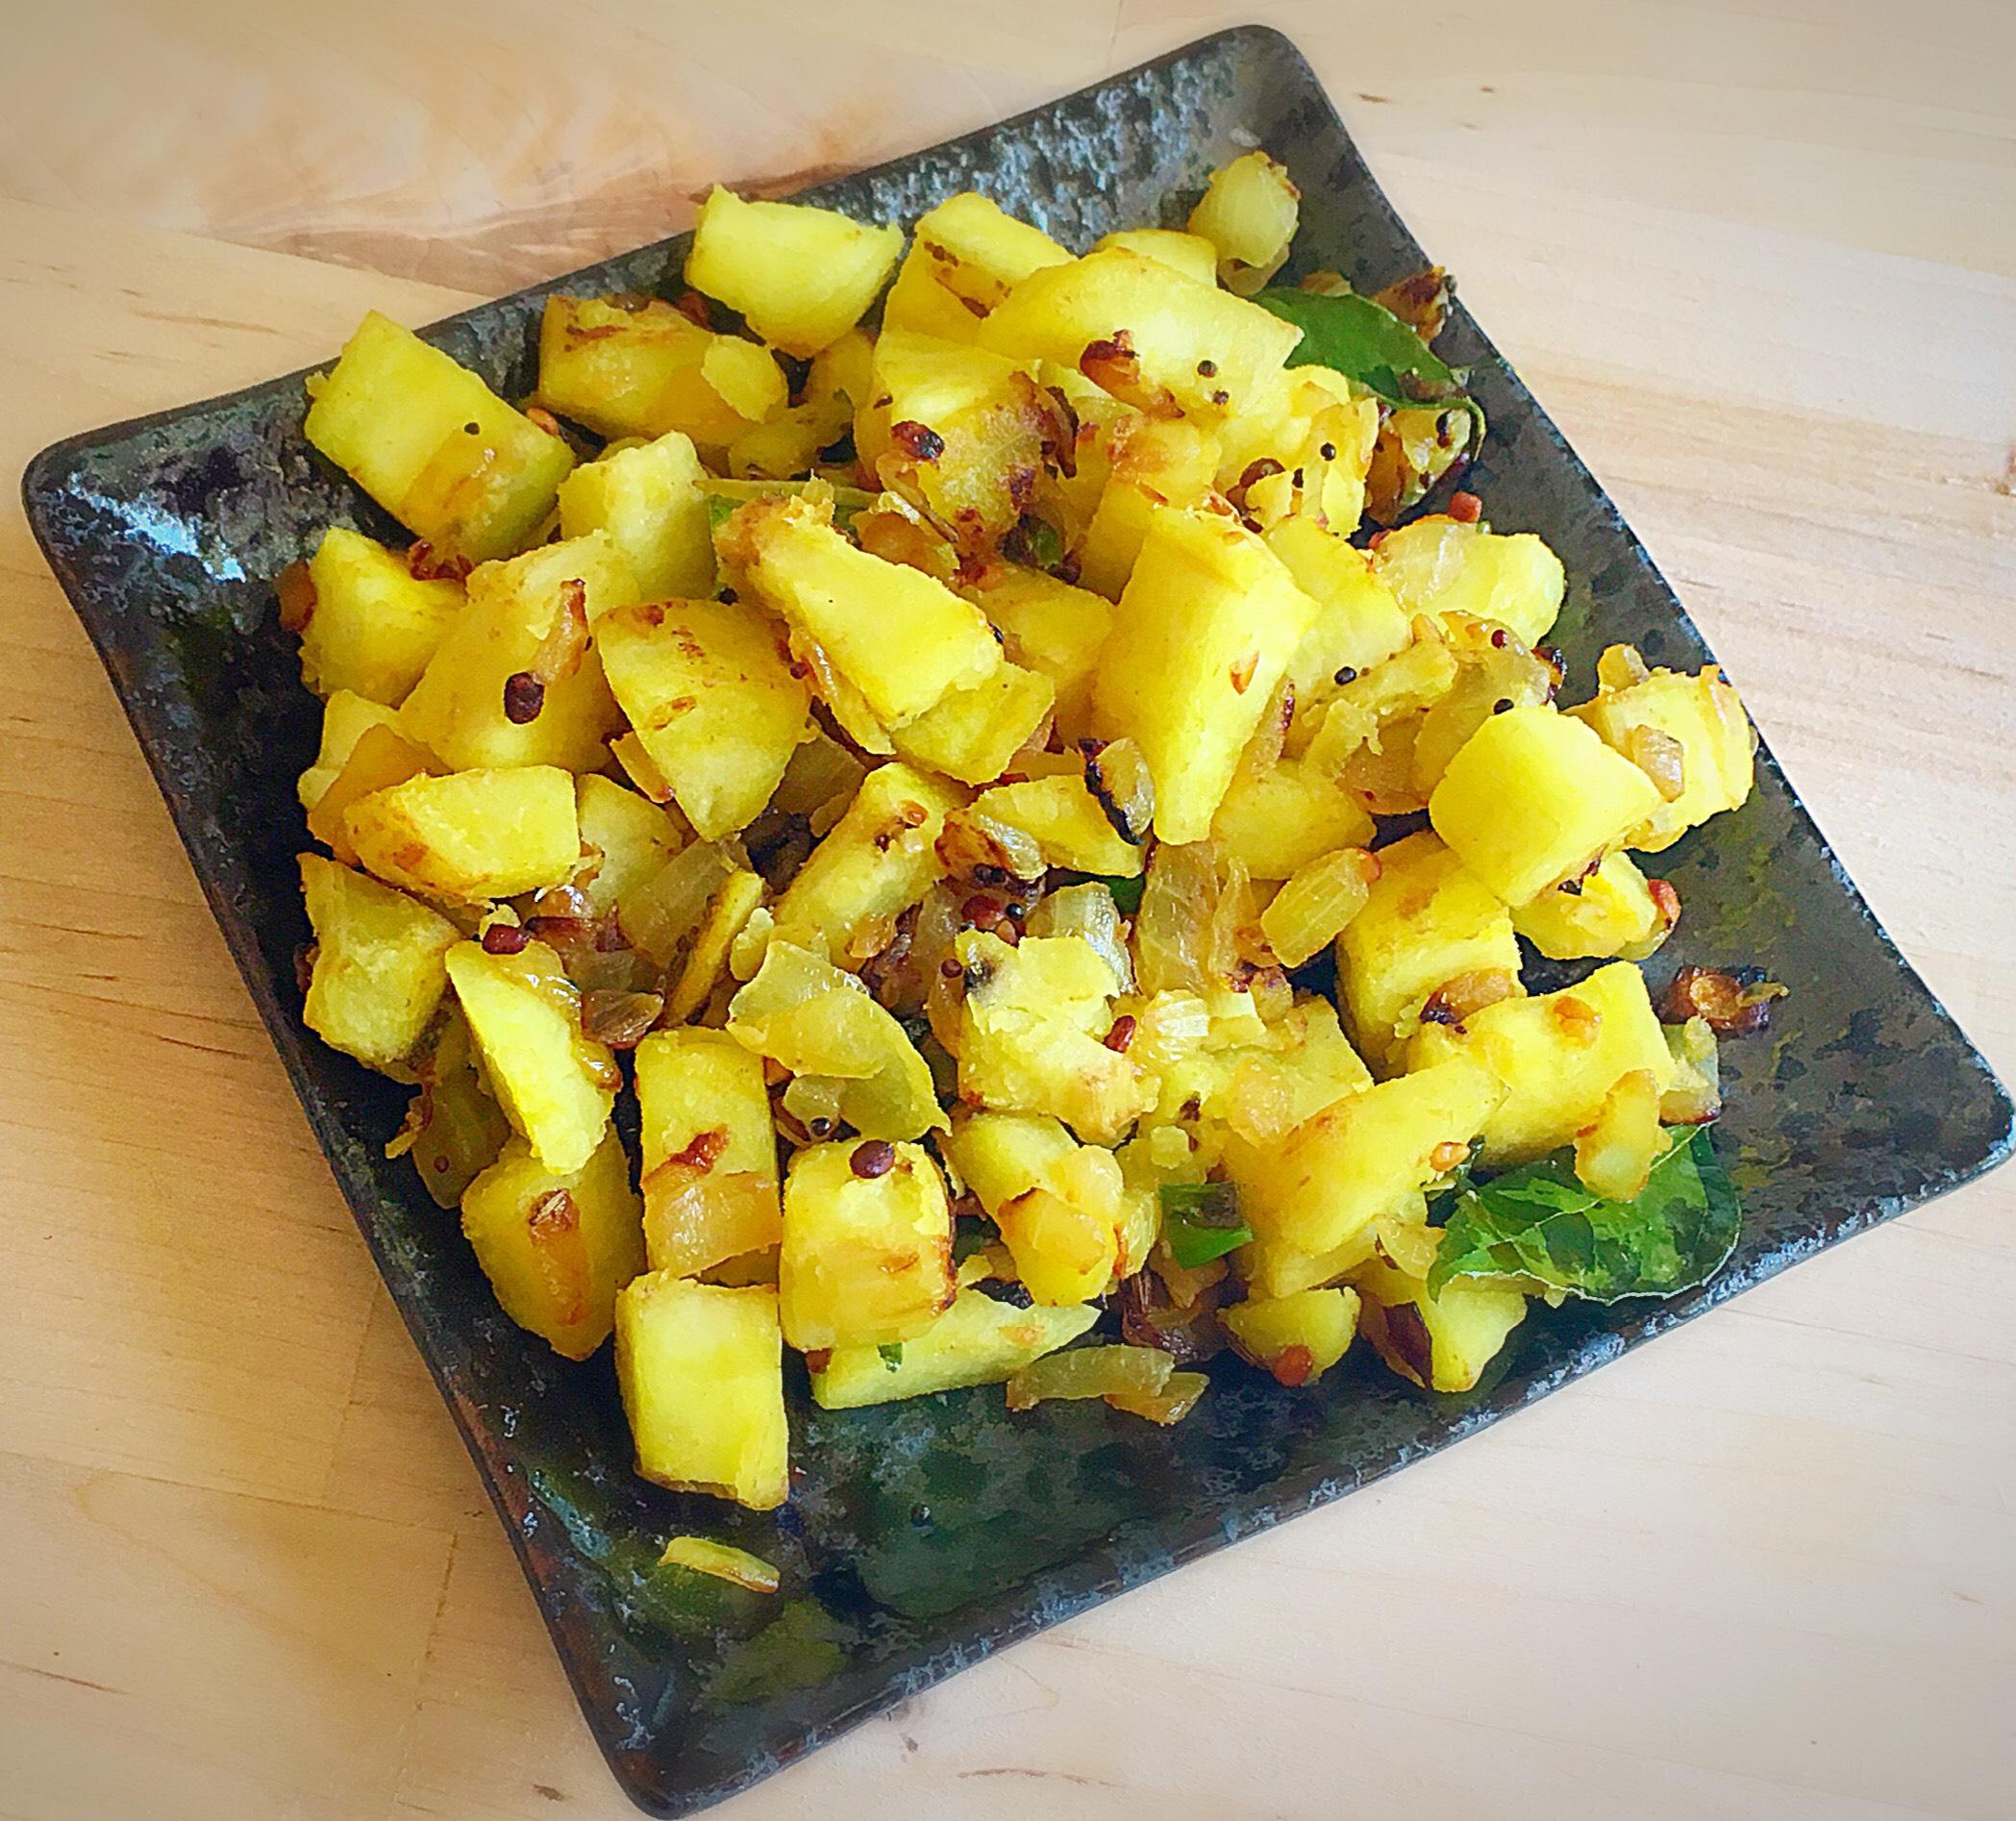 Vazhakkai Podimas,Plantain (Raw Banana) Stir Fry, vazhakkai varuval, vazhakkai roast,Raw Banana,podimas, vazhakkai fry,plantain podimas,raw banana podimas,stir fry,plantain stir fry,raw banan stir fry,vazhakkai stir fry,vazhakkai dry ,vazhakkai masala,plantain podimas,